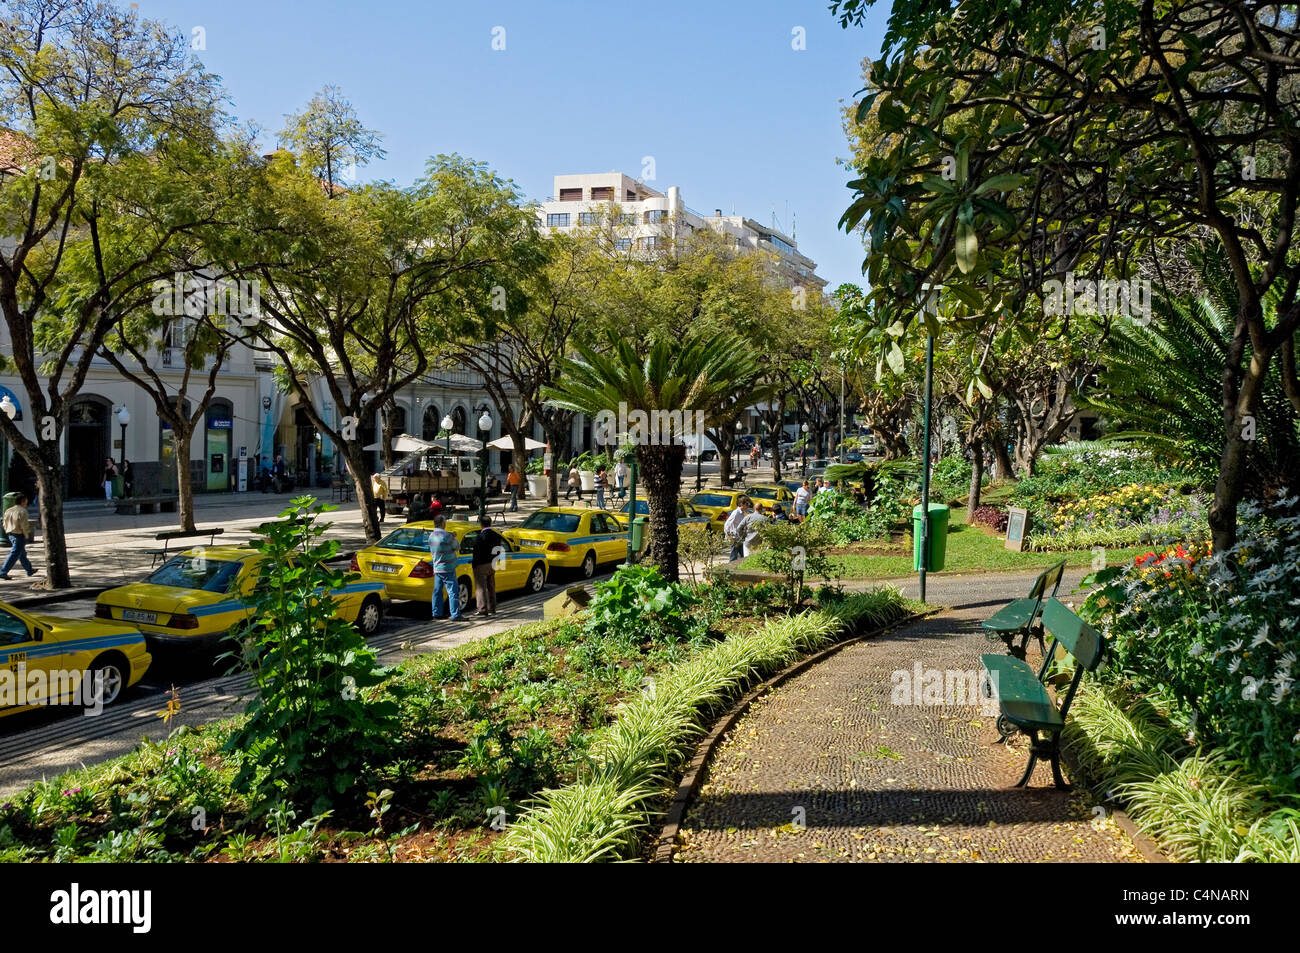 Jardim Municipal Gardens Funchal Madeira Portugal EU Europe   Stock Image